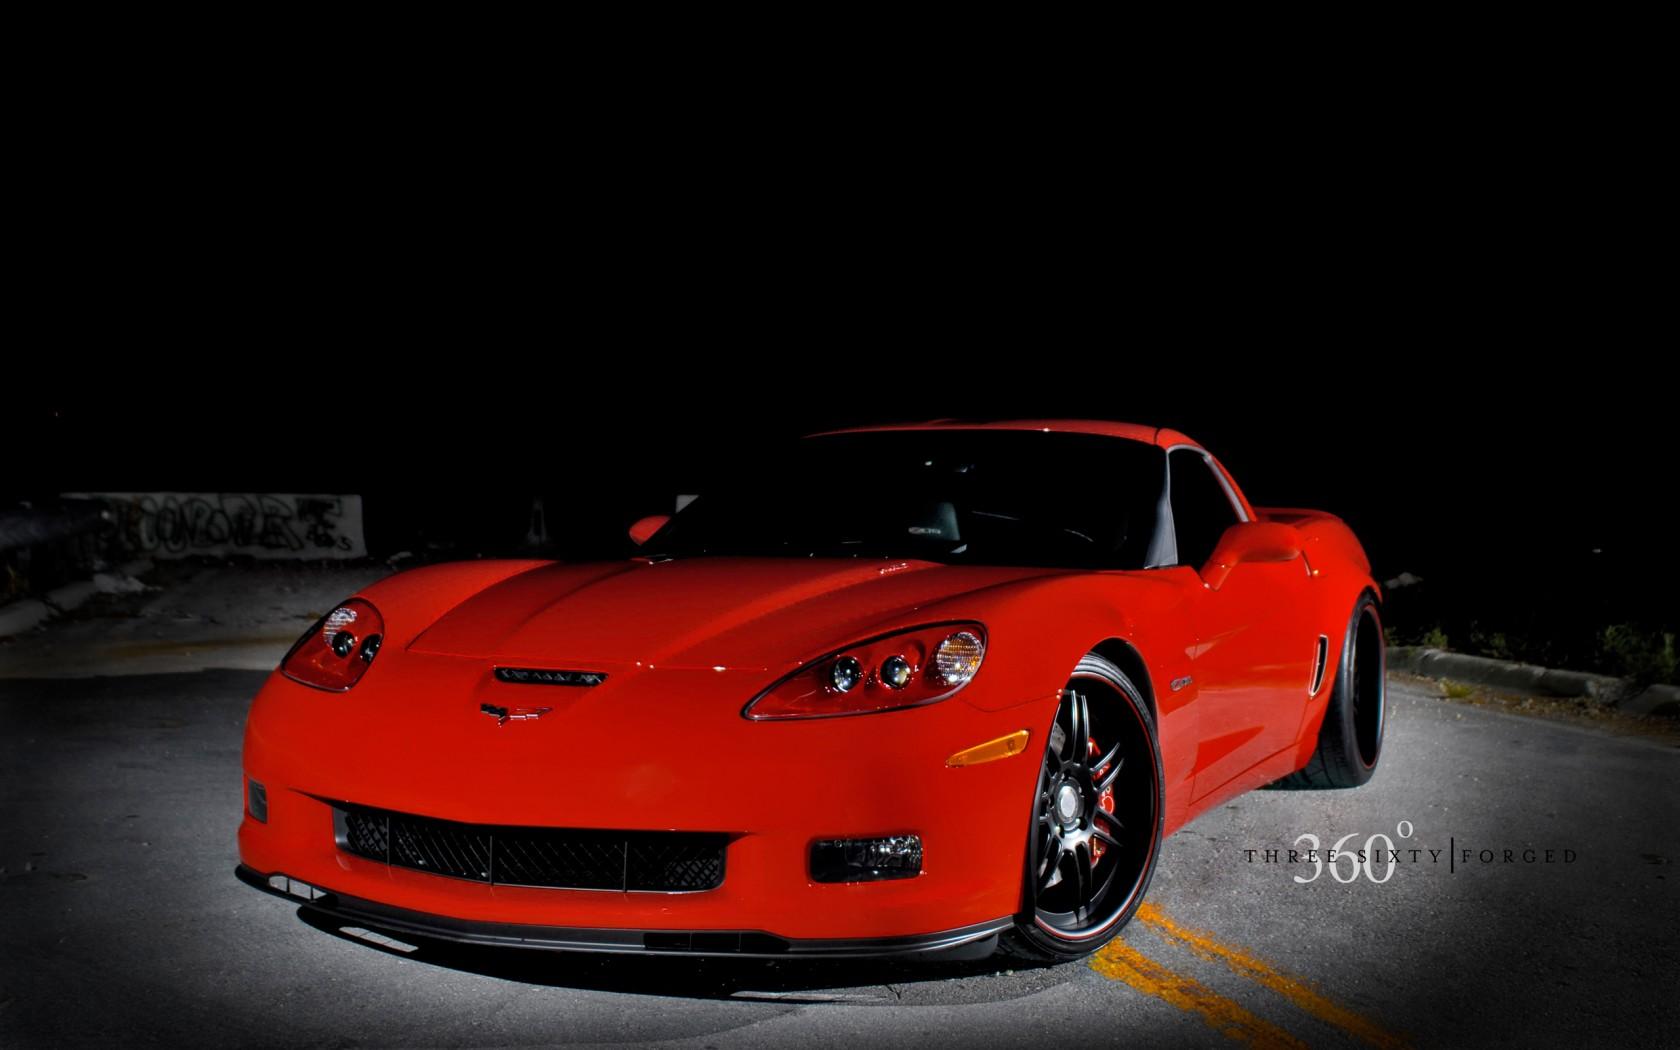 Widescreen Car Wallpaper Corvette Z06 360 Forged Wheels Wallpaper Hd Car